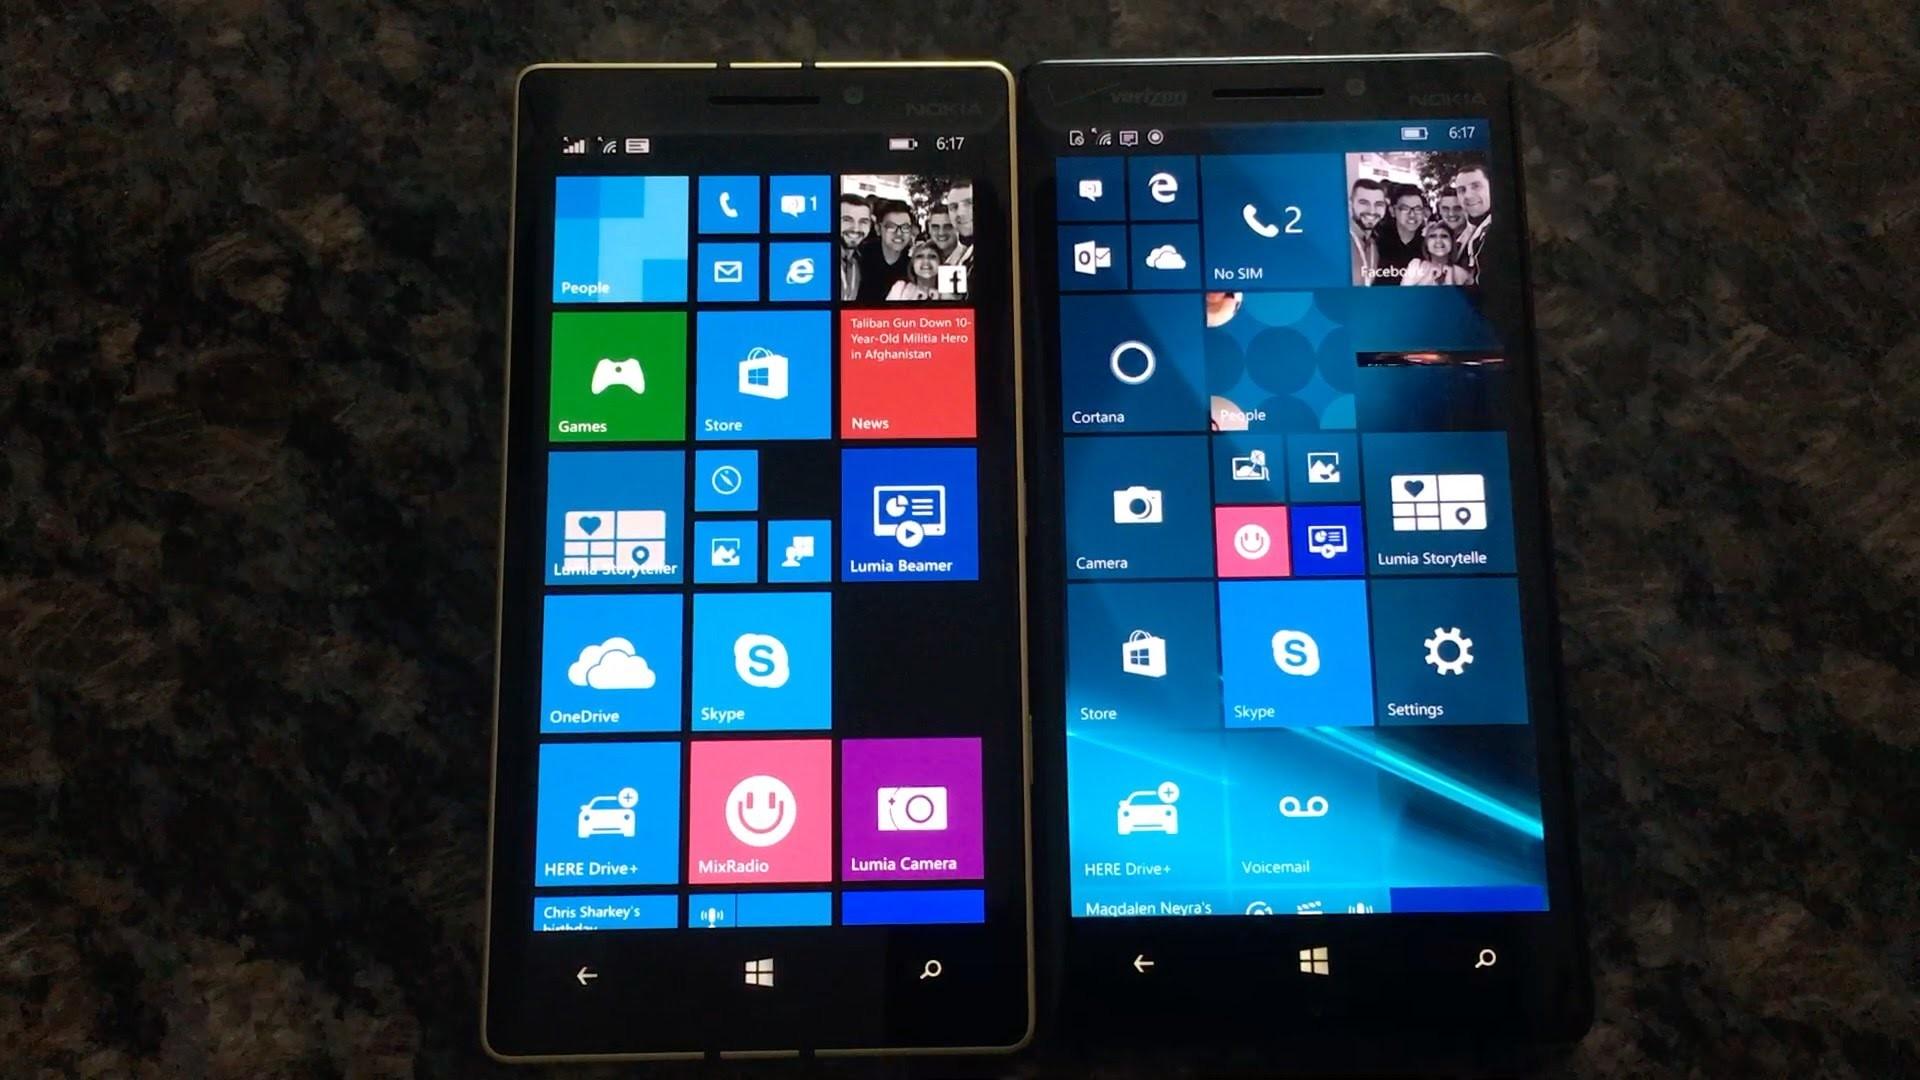 Windows 10 Mobile 10586.71 vs Windows Phone 8.1 Speed Test